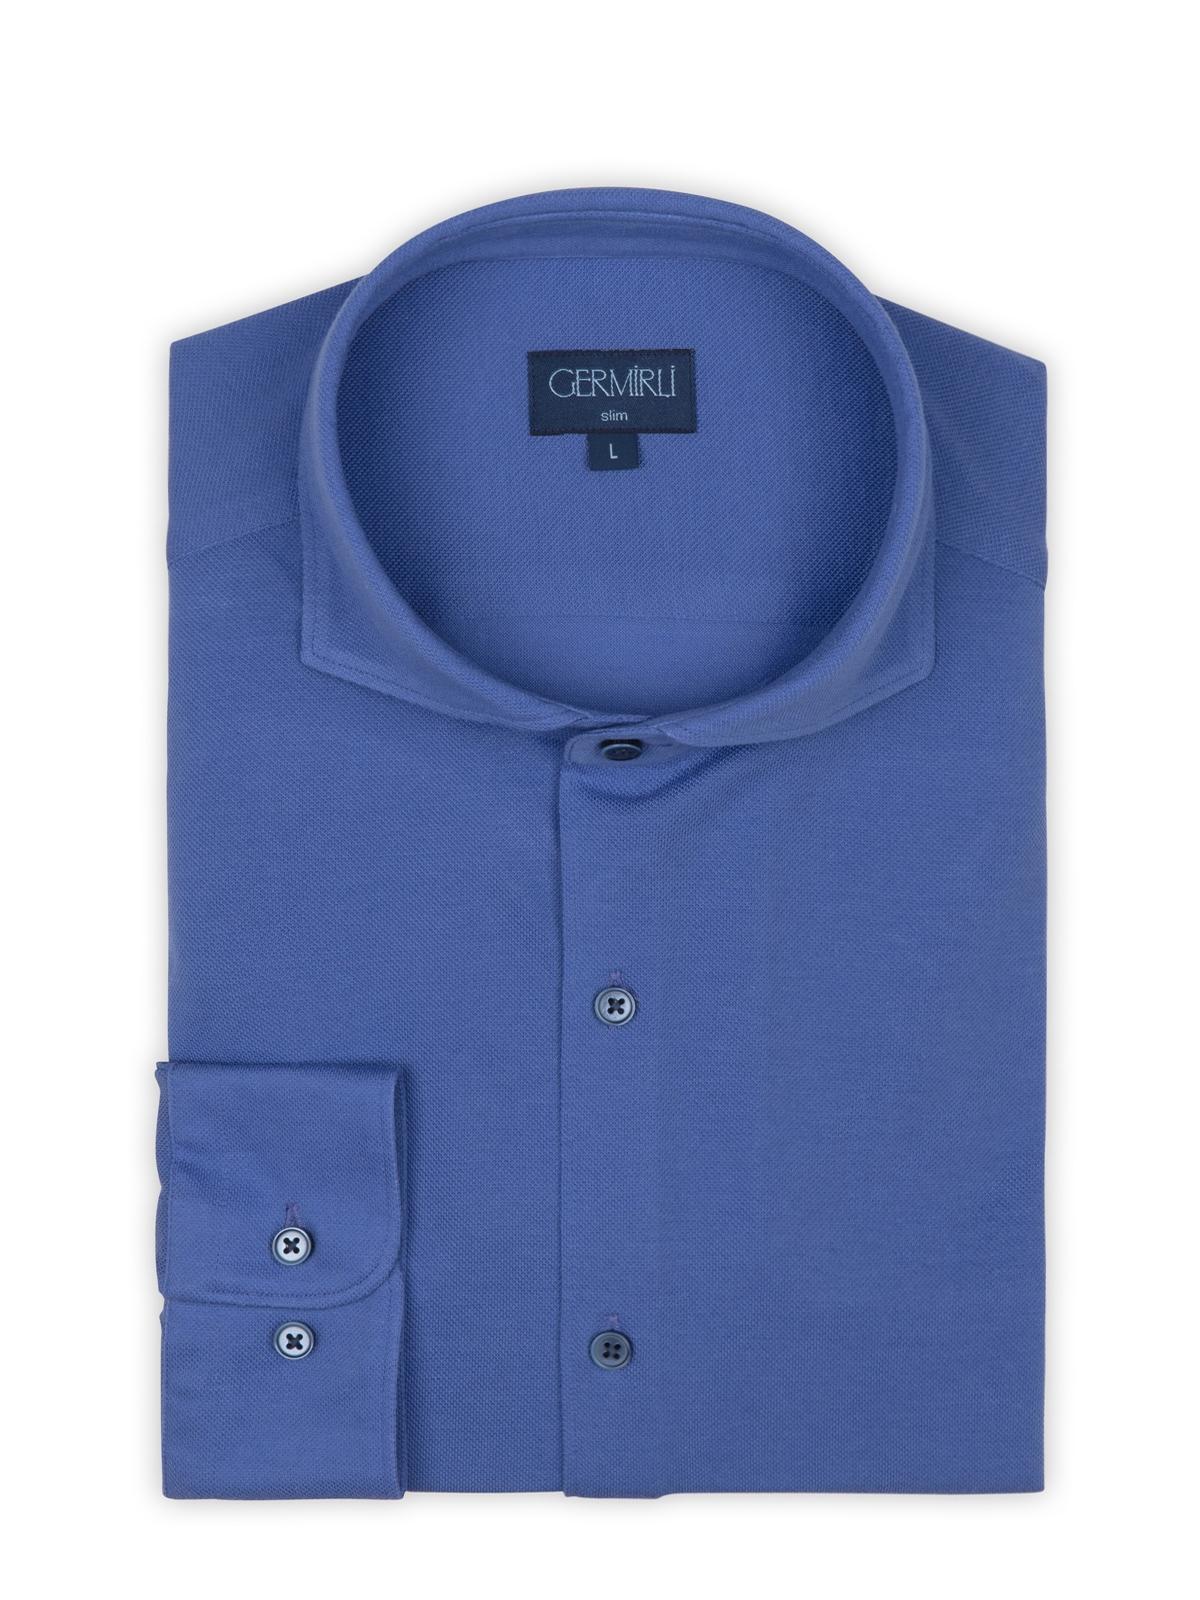 Germirli Mor Italyan Yaka Örme Slim Fit Gömlek